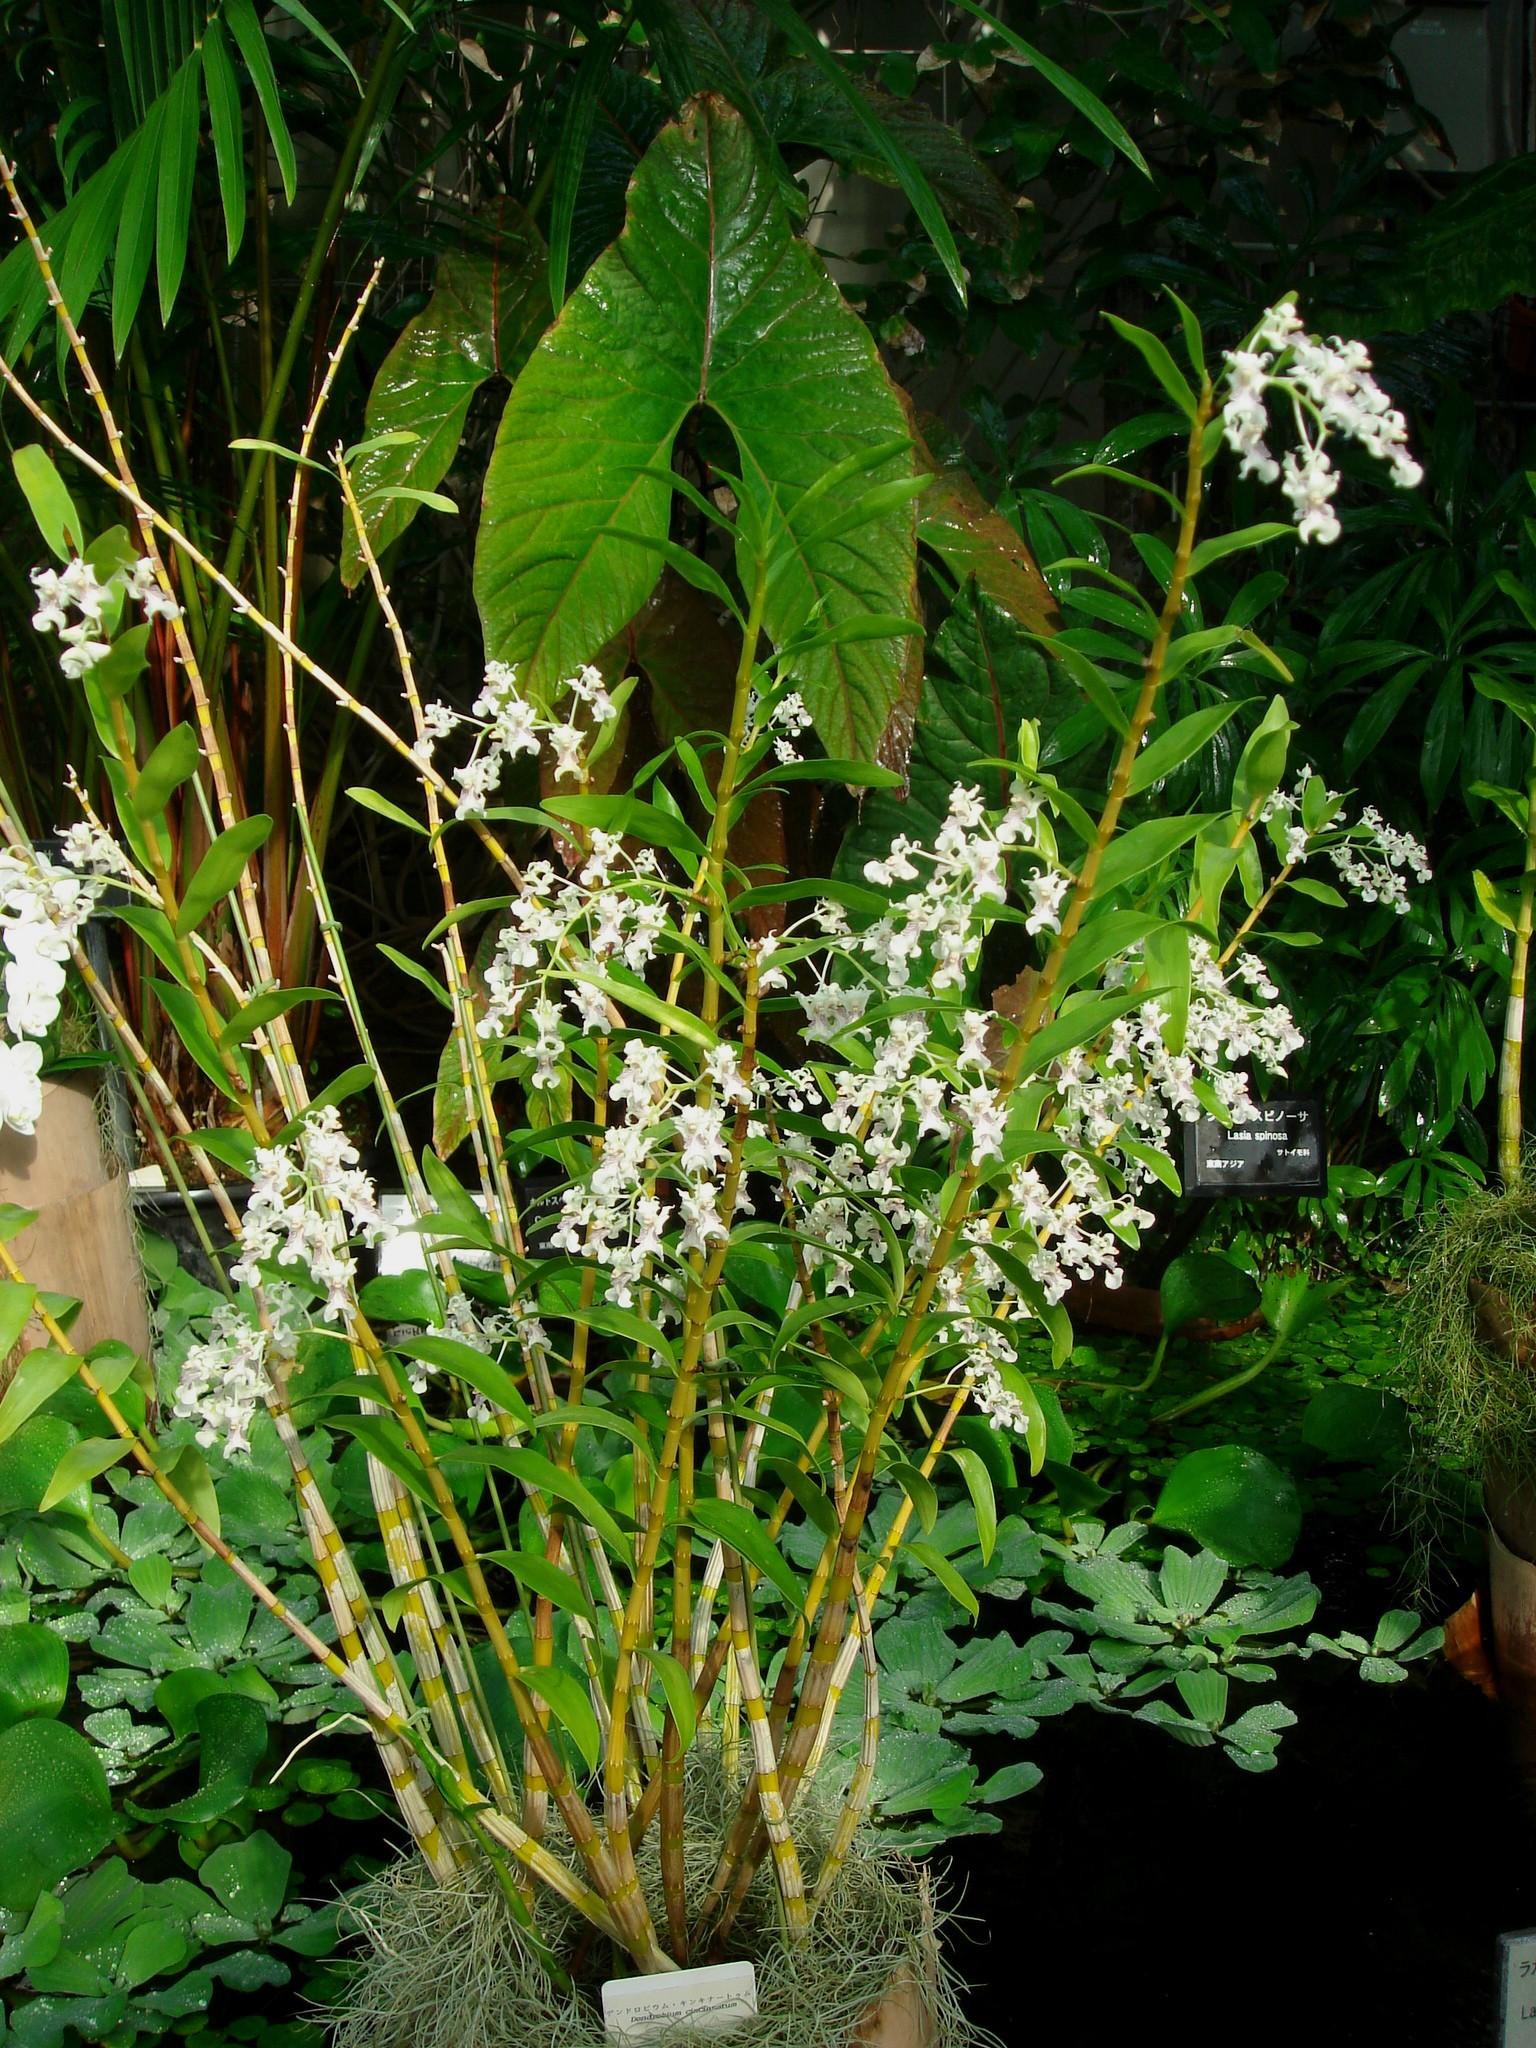 http://orchids.la.coocan.jp/Dendrobium/Dendrobium%20chalmersii/DSC09012.JPG